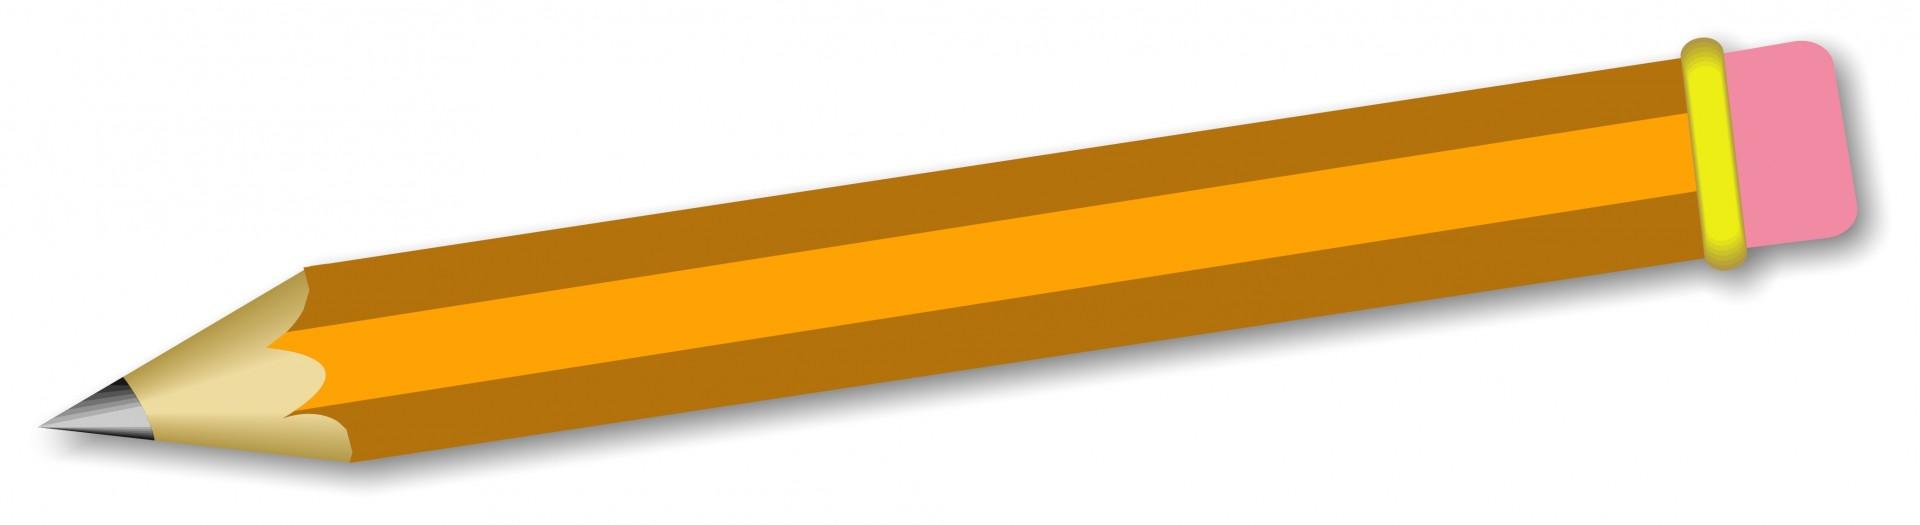 Pencil Clip Art - clipartall